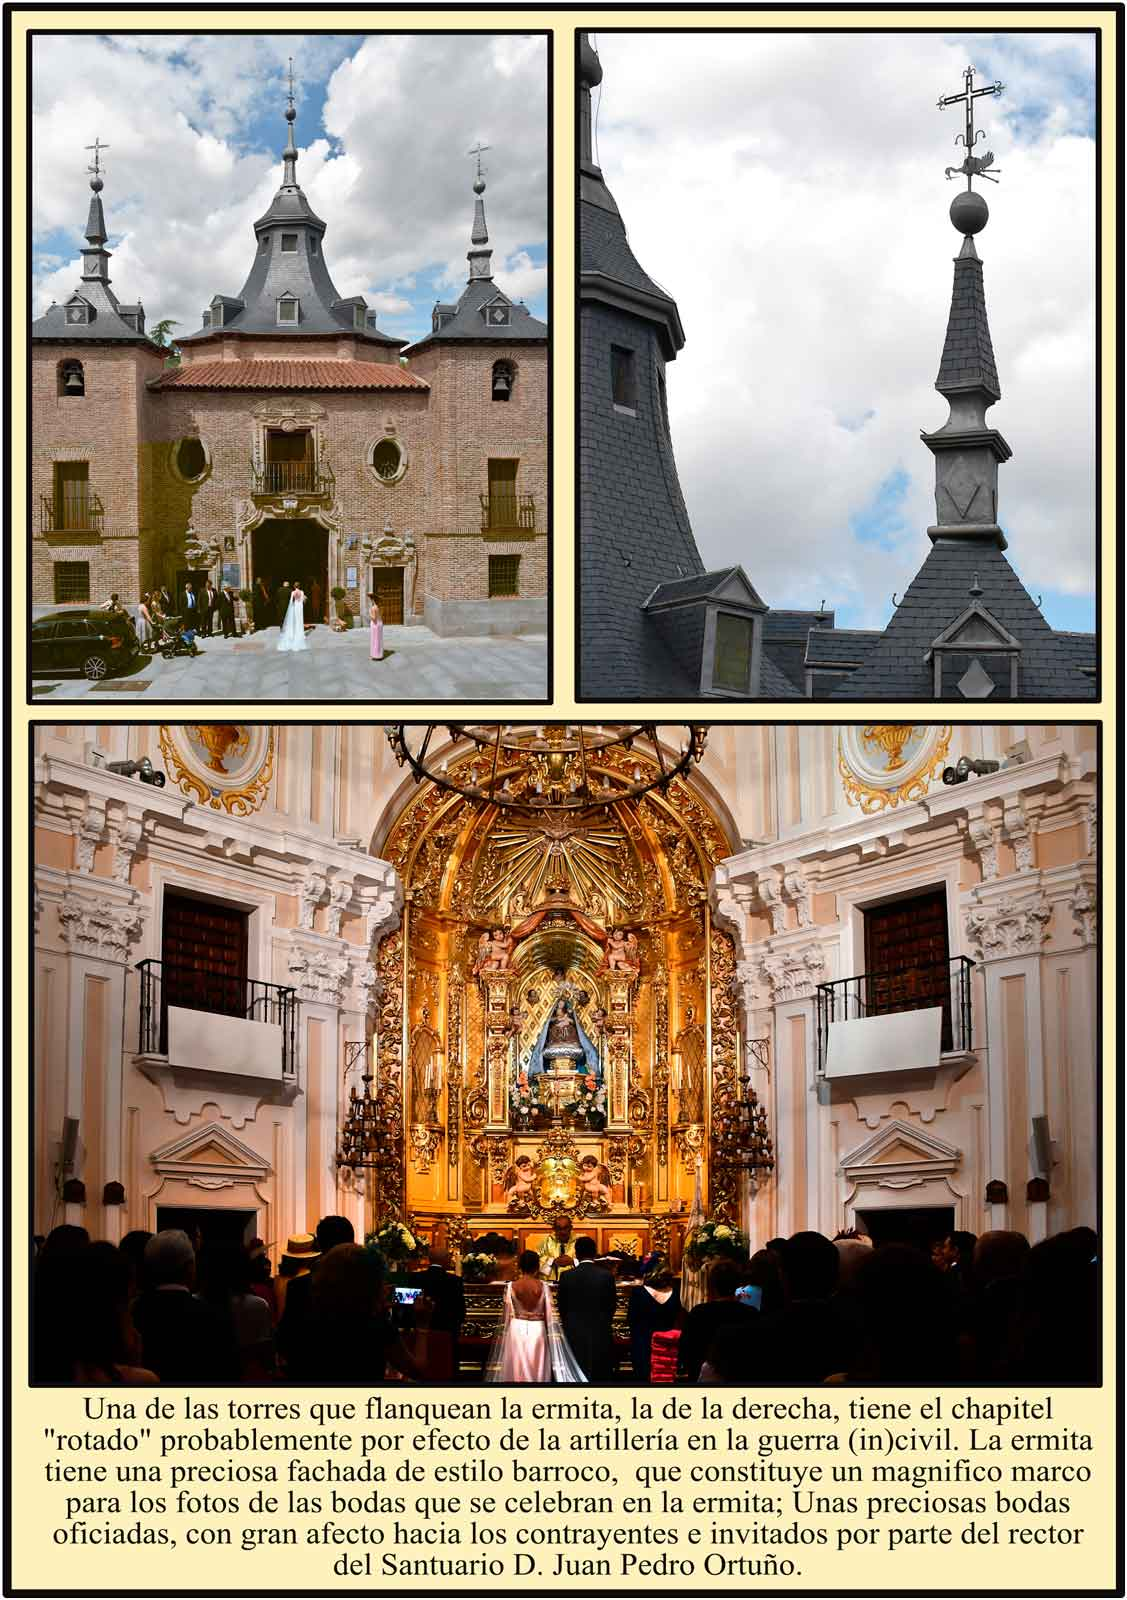 Madrid  Chapitel torcido Virgen del Puerto Bodas